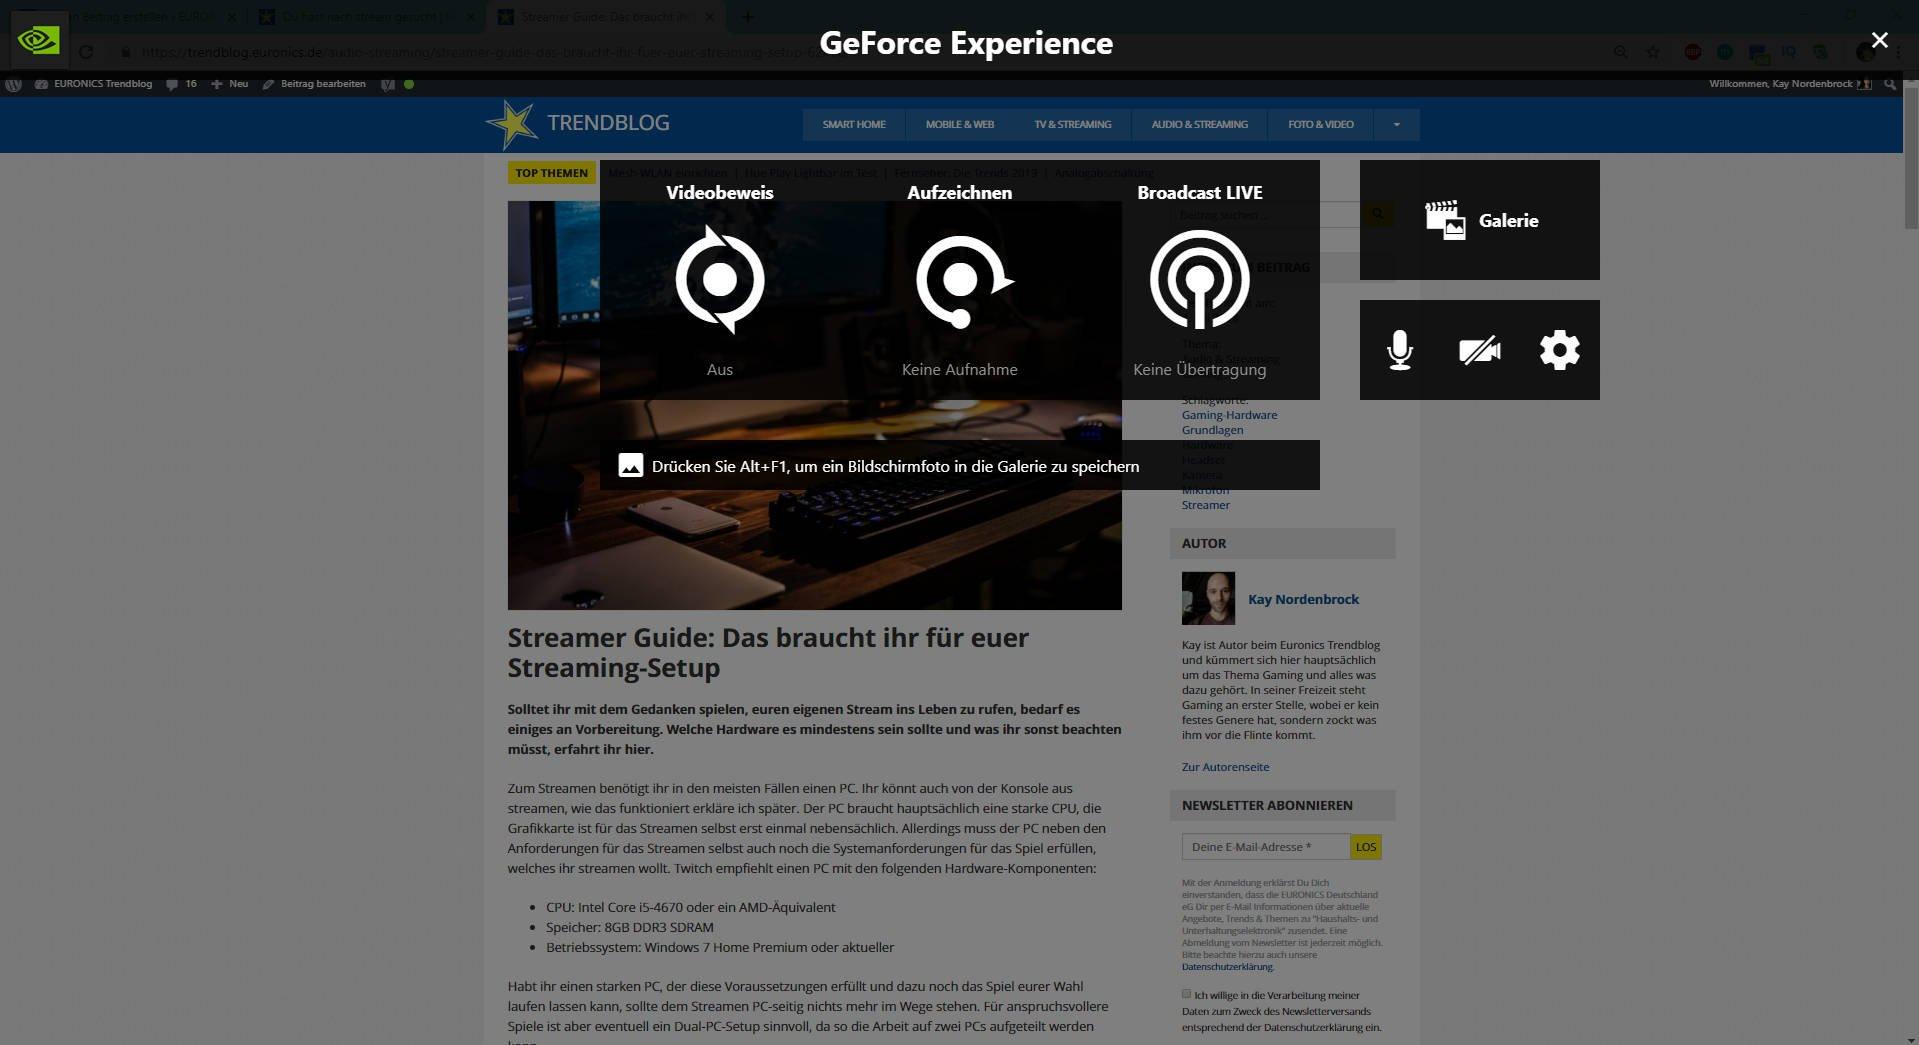 2 Nvidia GeForce Experience